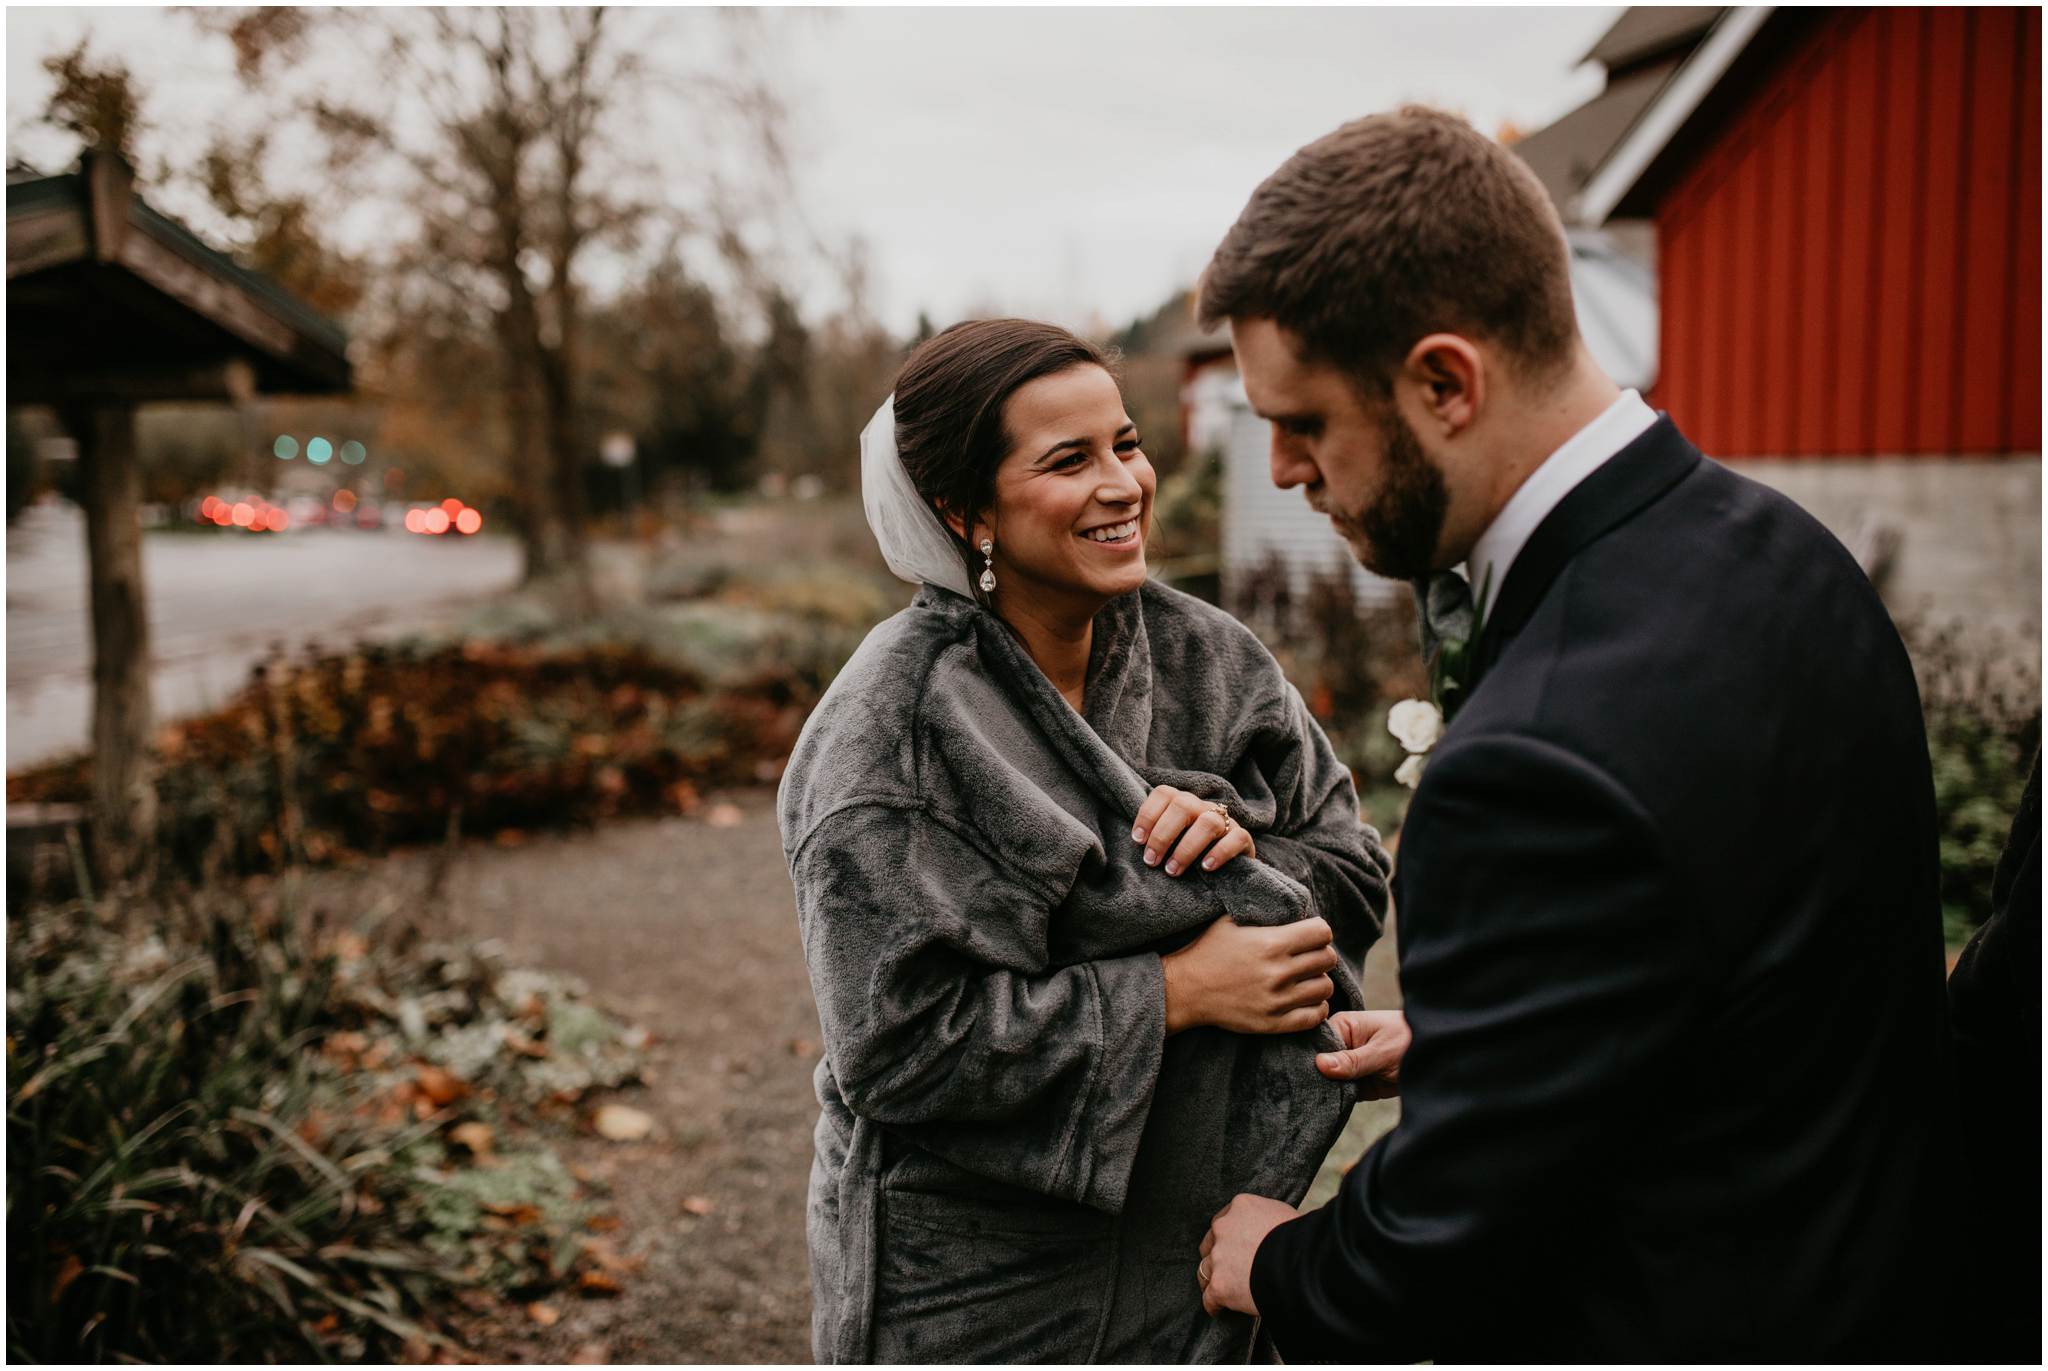 ashley-tj-the-pickering-barn-winter-wedding-seattle-photographer-048.jpg